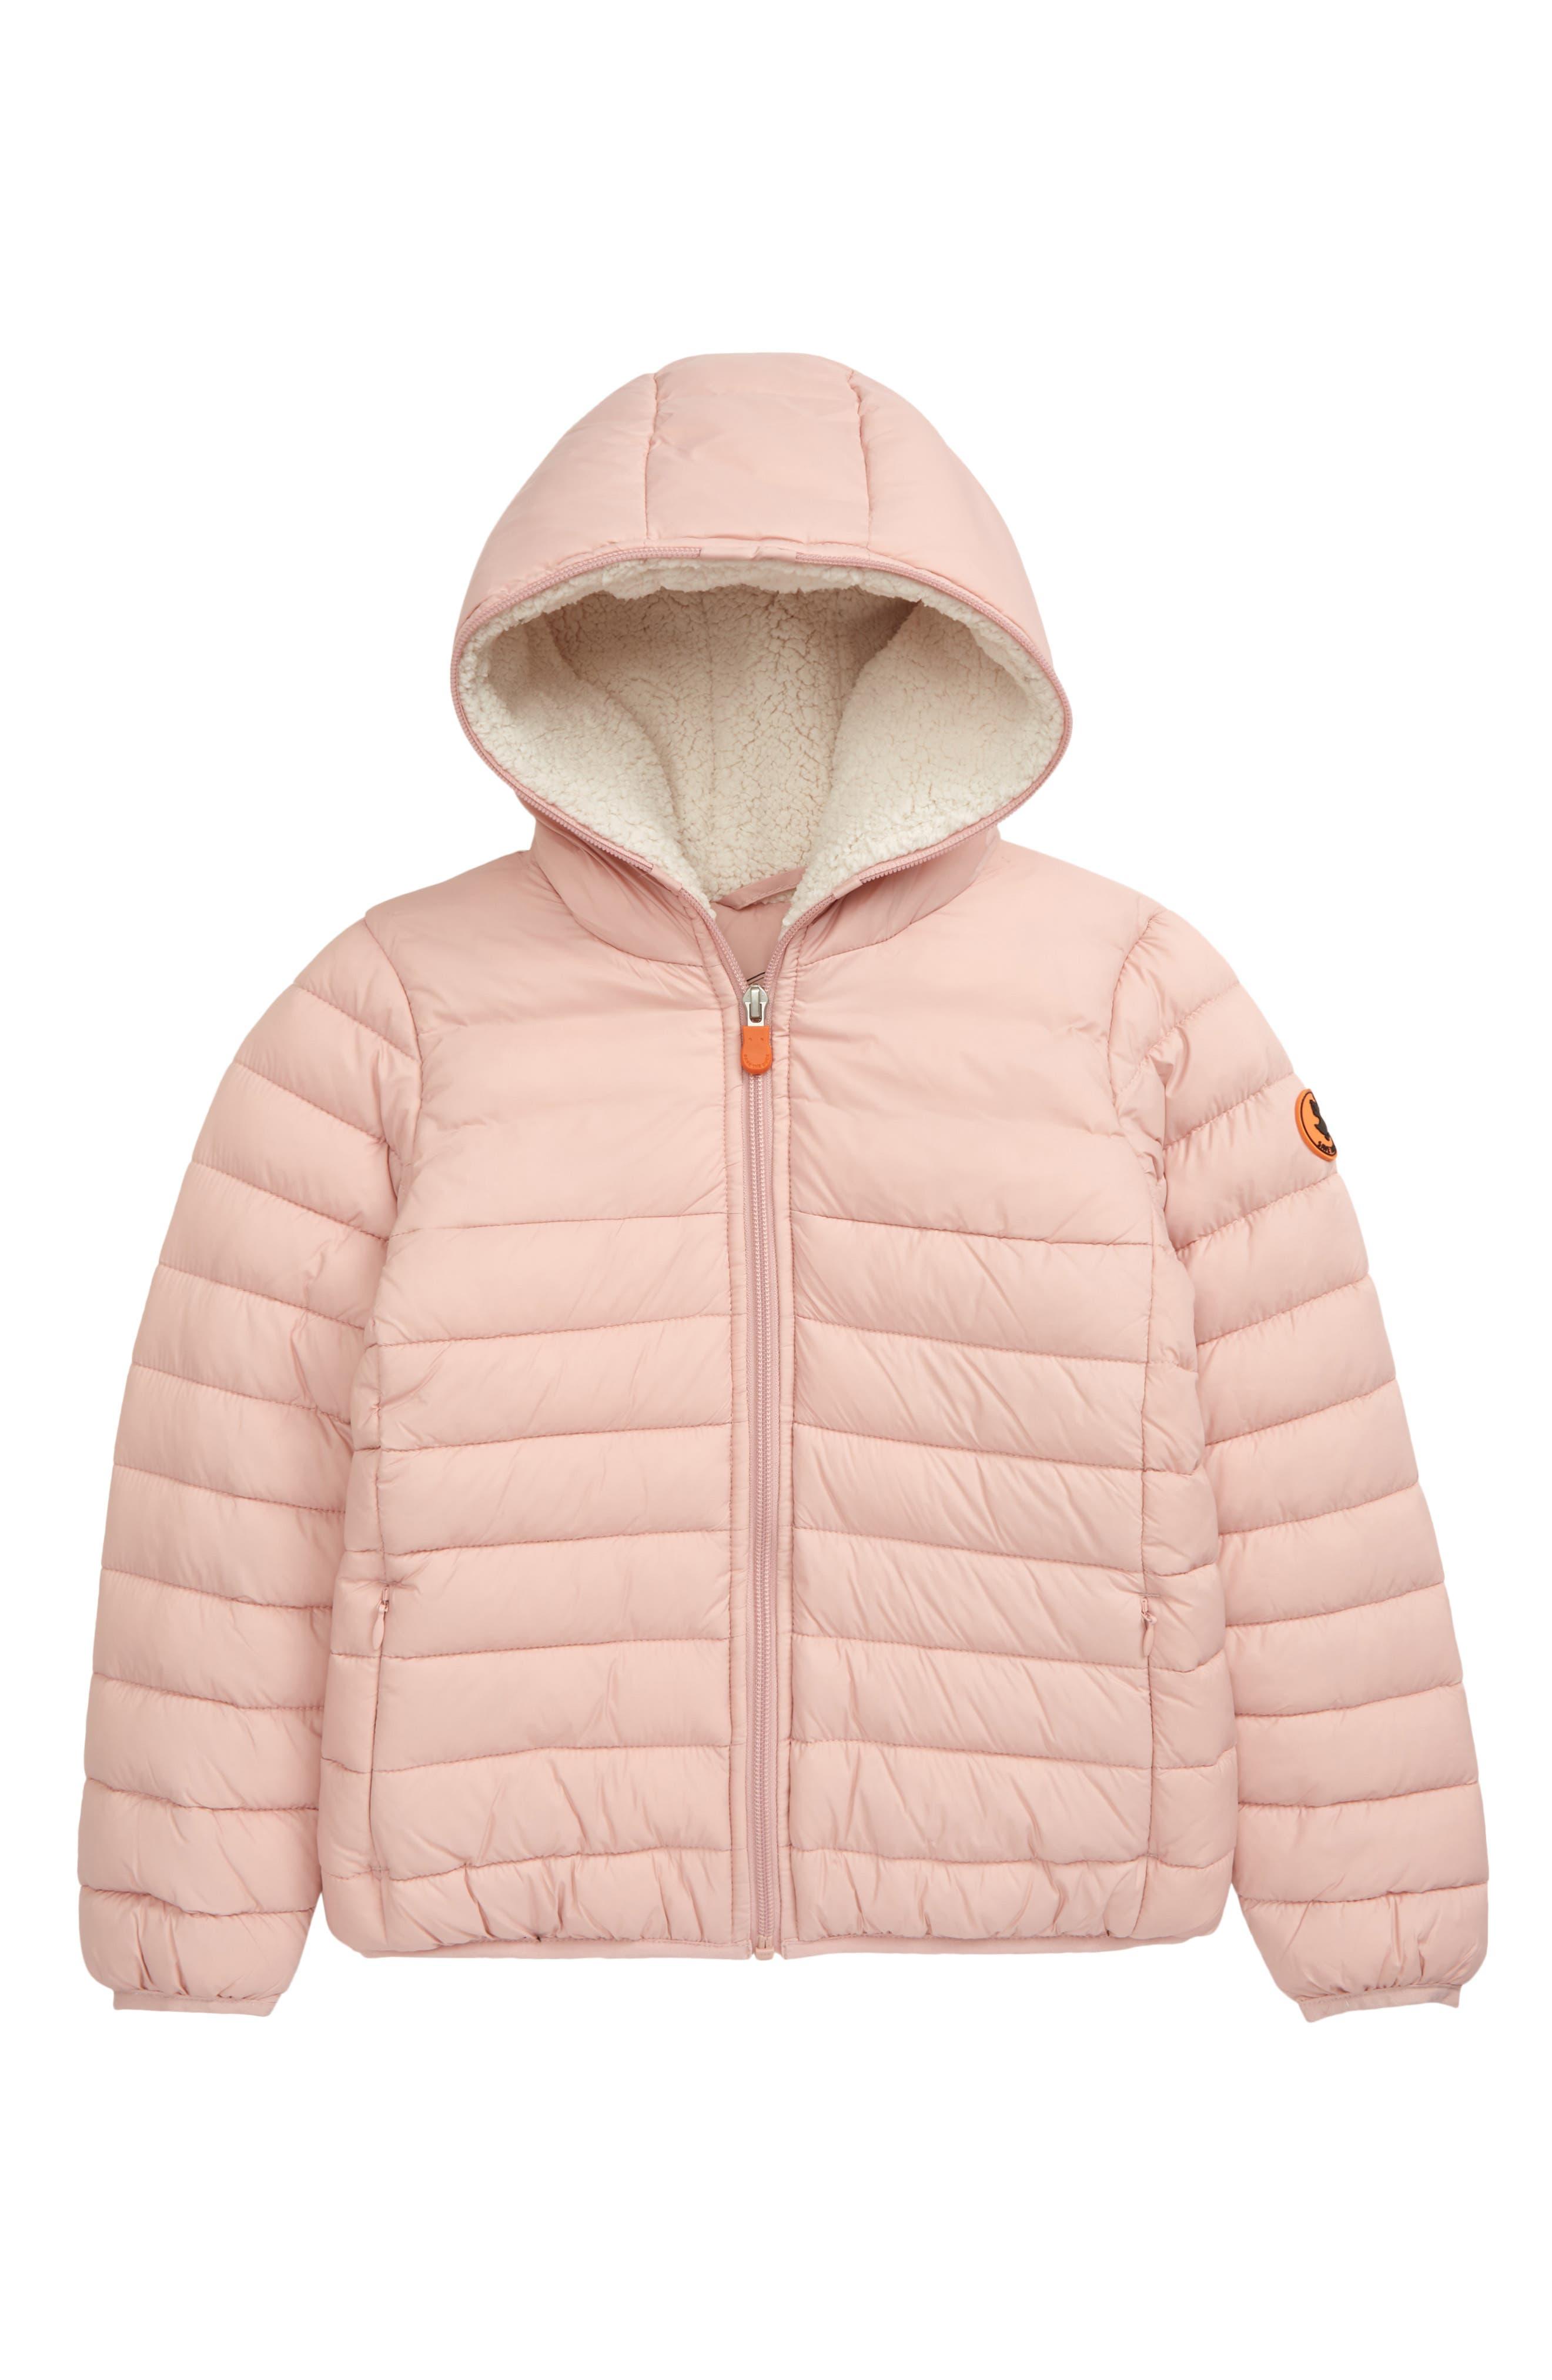 Girls Heavy Lined Light Pink Hooded Coat Jacket NEW Sizes 4-14 years Khaki